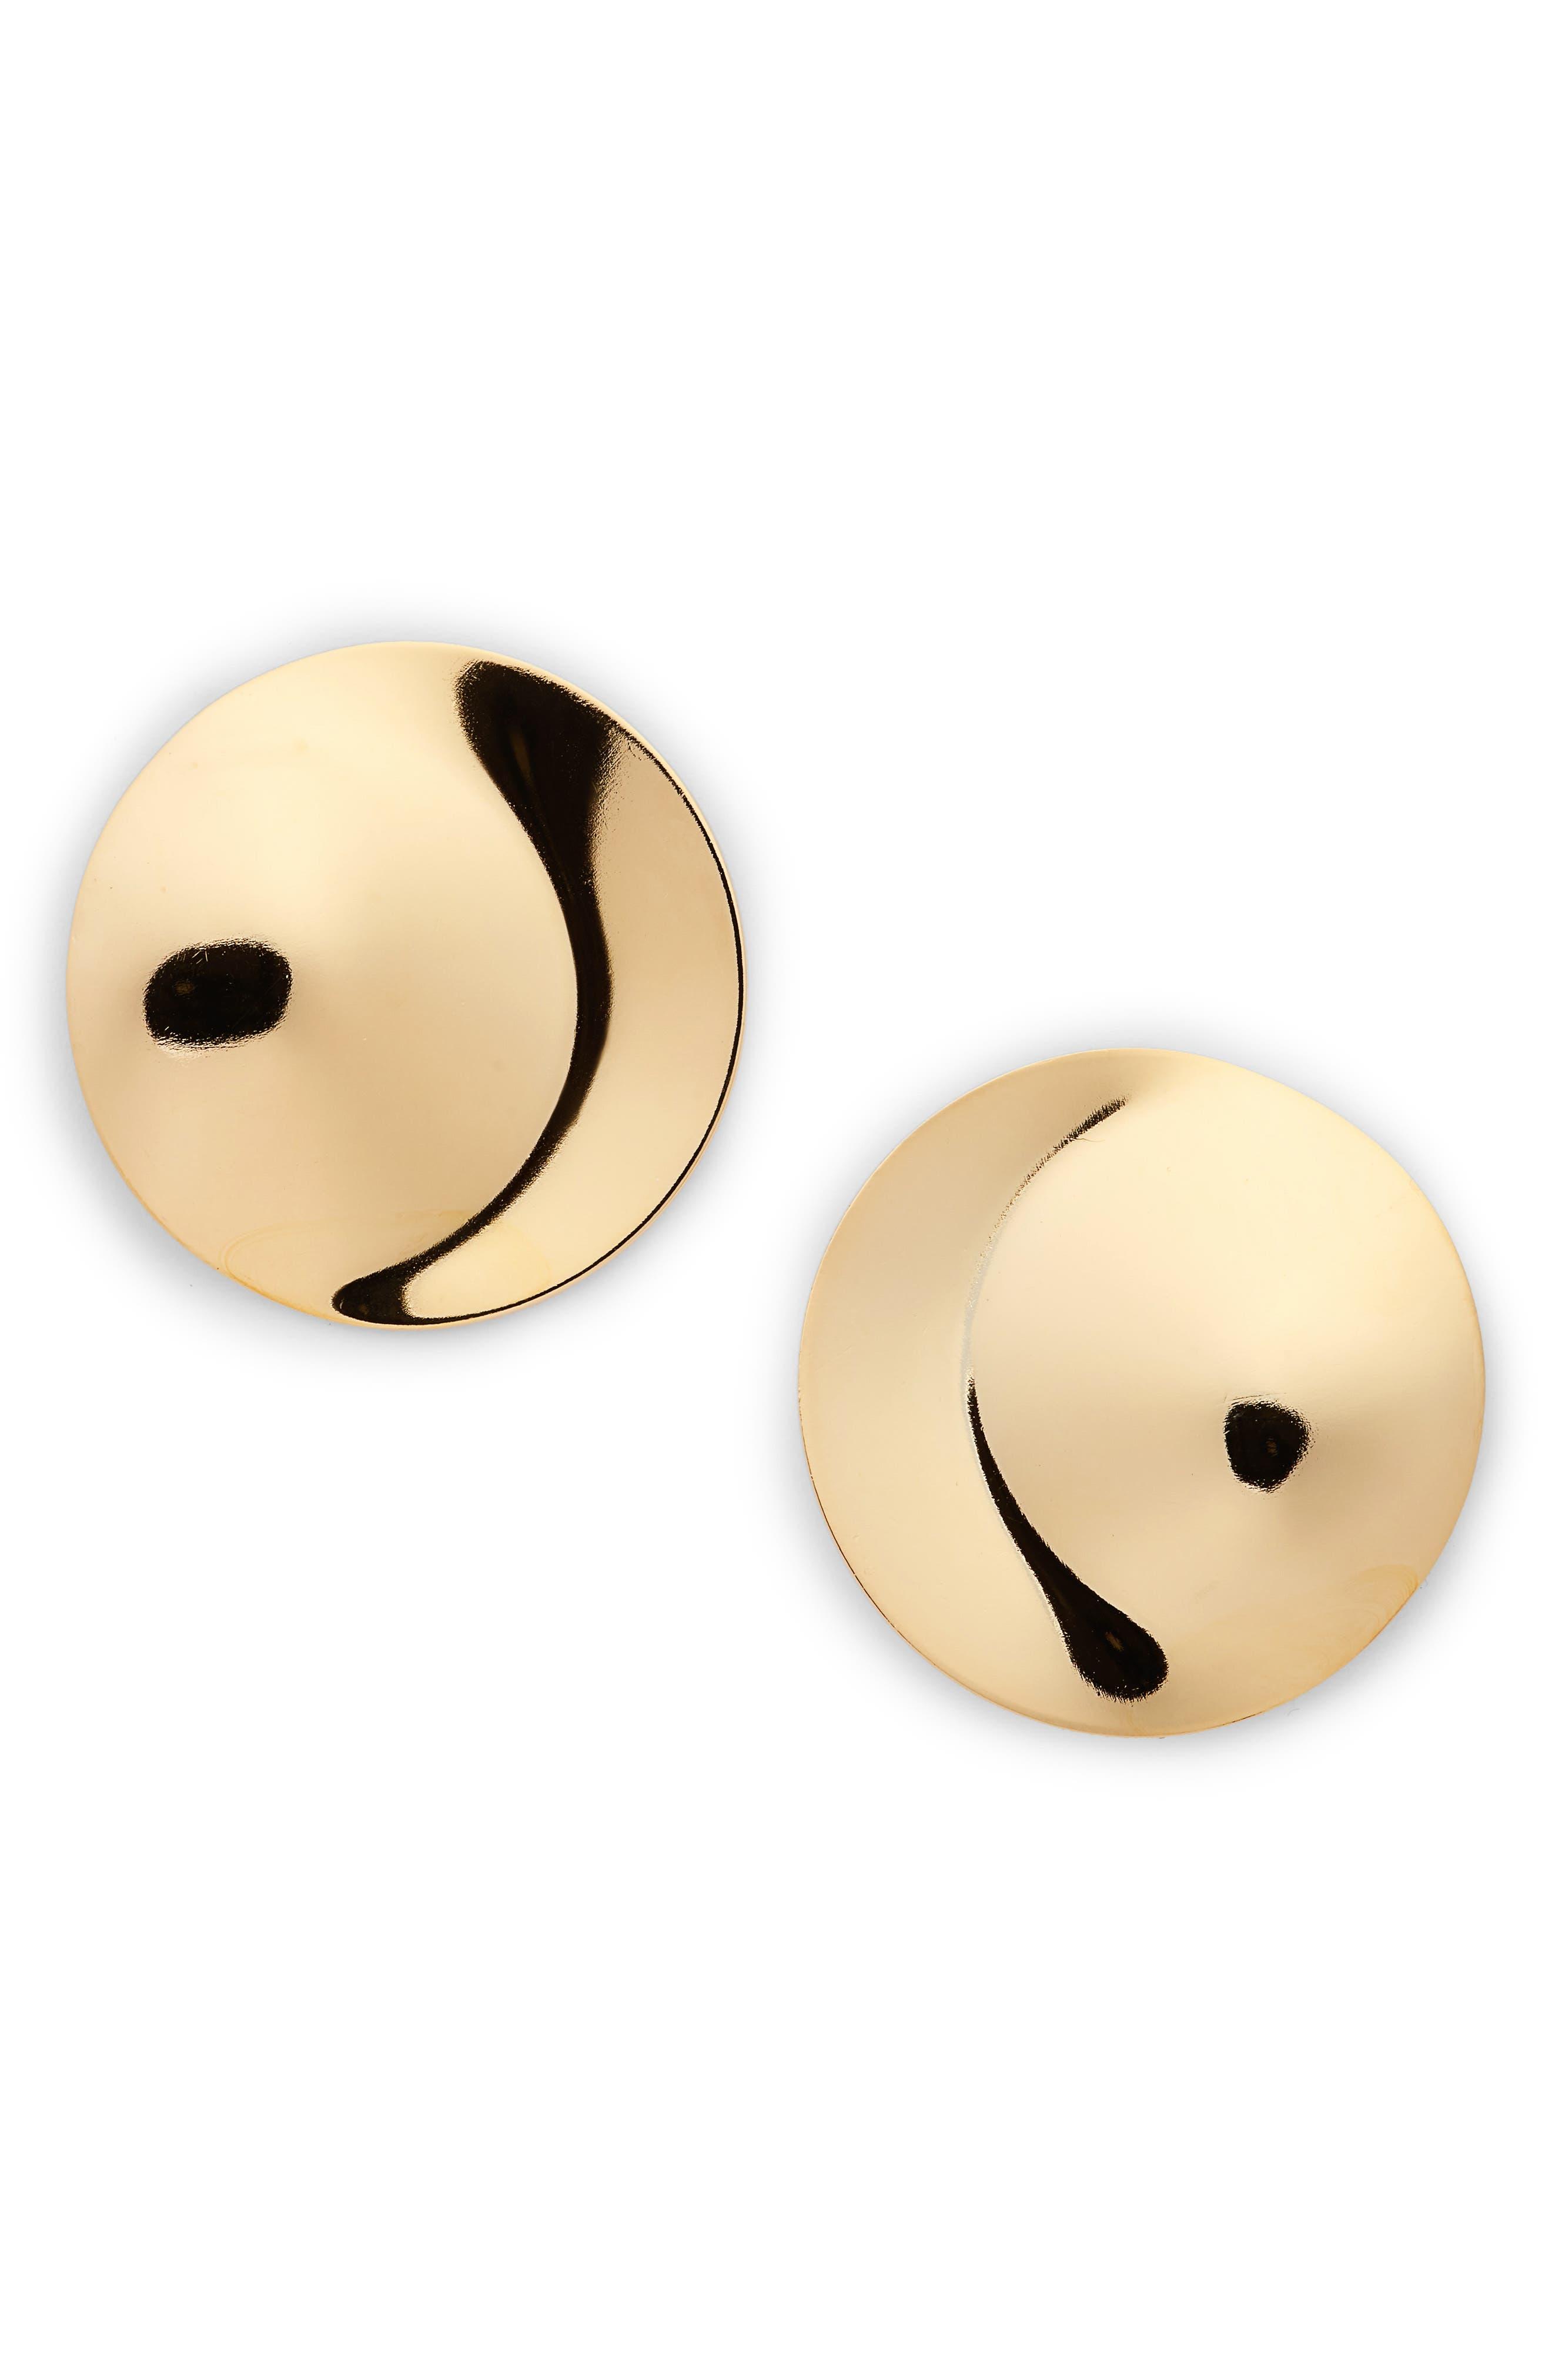 Penny Moon Stud Earrings,                         Main,                         color, Gold